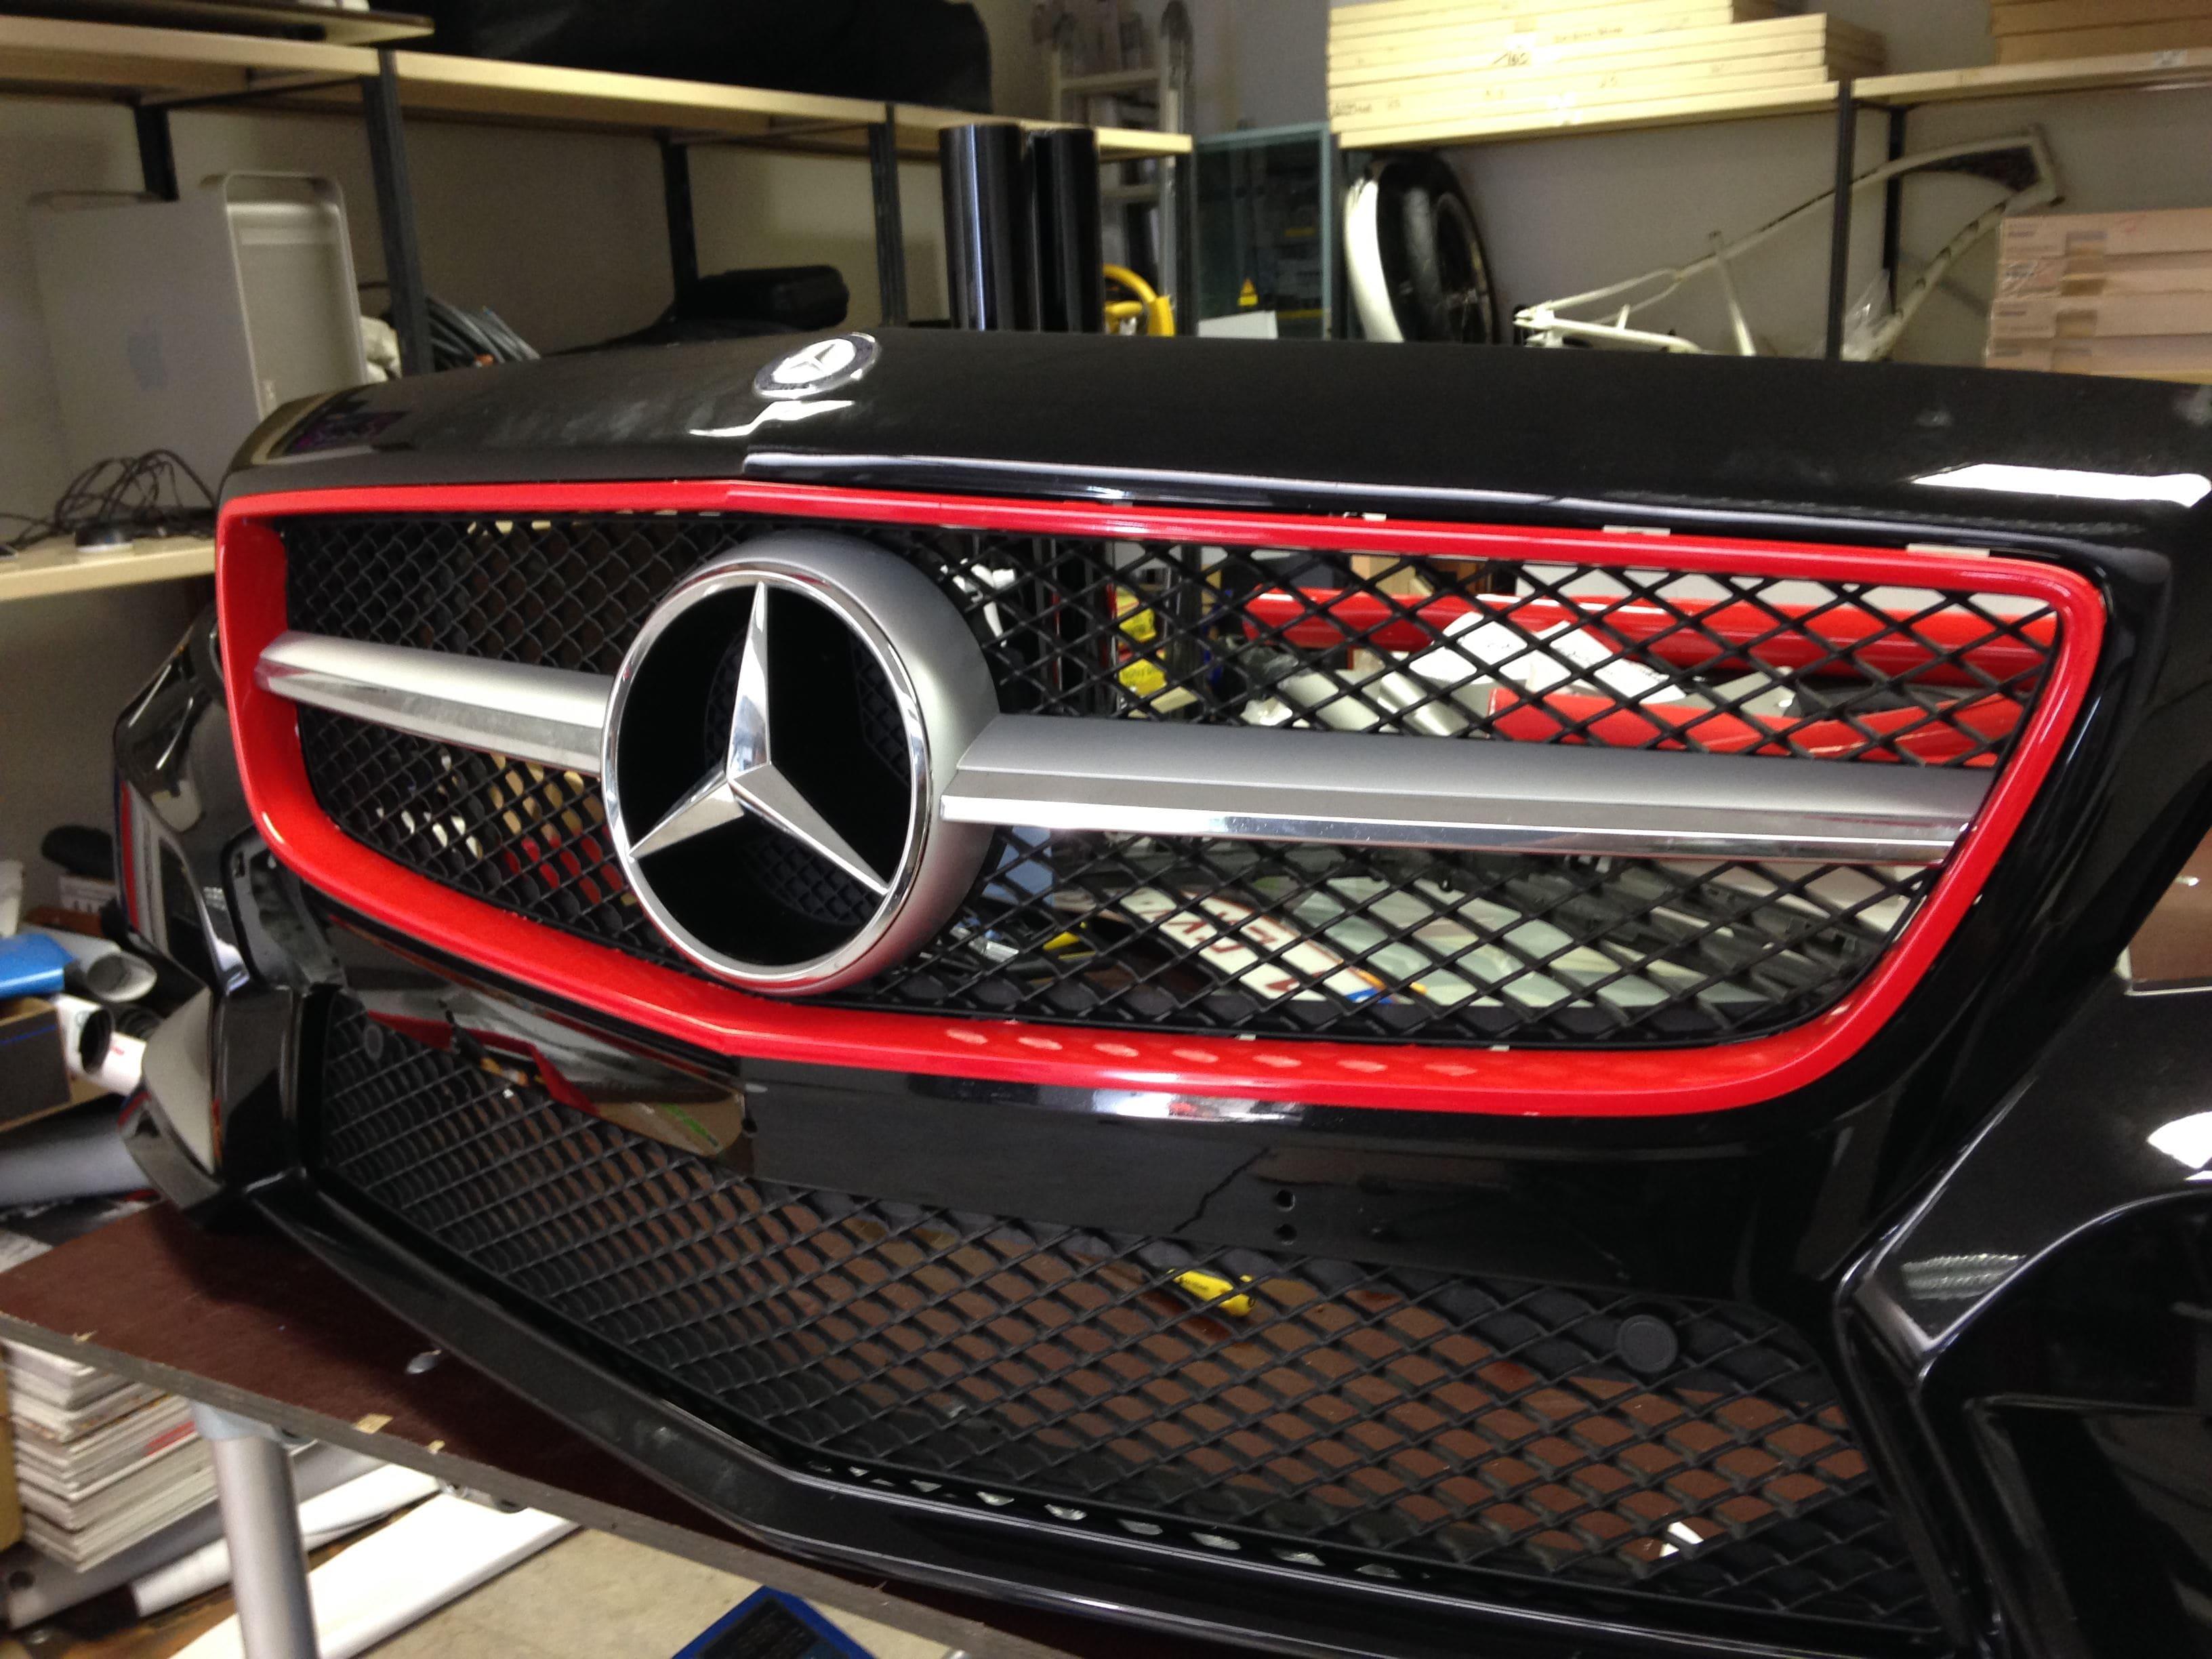 Mercedes CLS met Mat Grey Aluminium Wrap, Carwrapping door Wrapmyride.nu Foto-nr:6137, ©2020